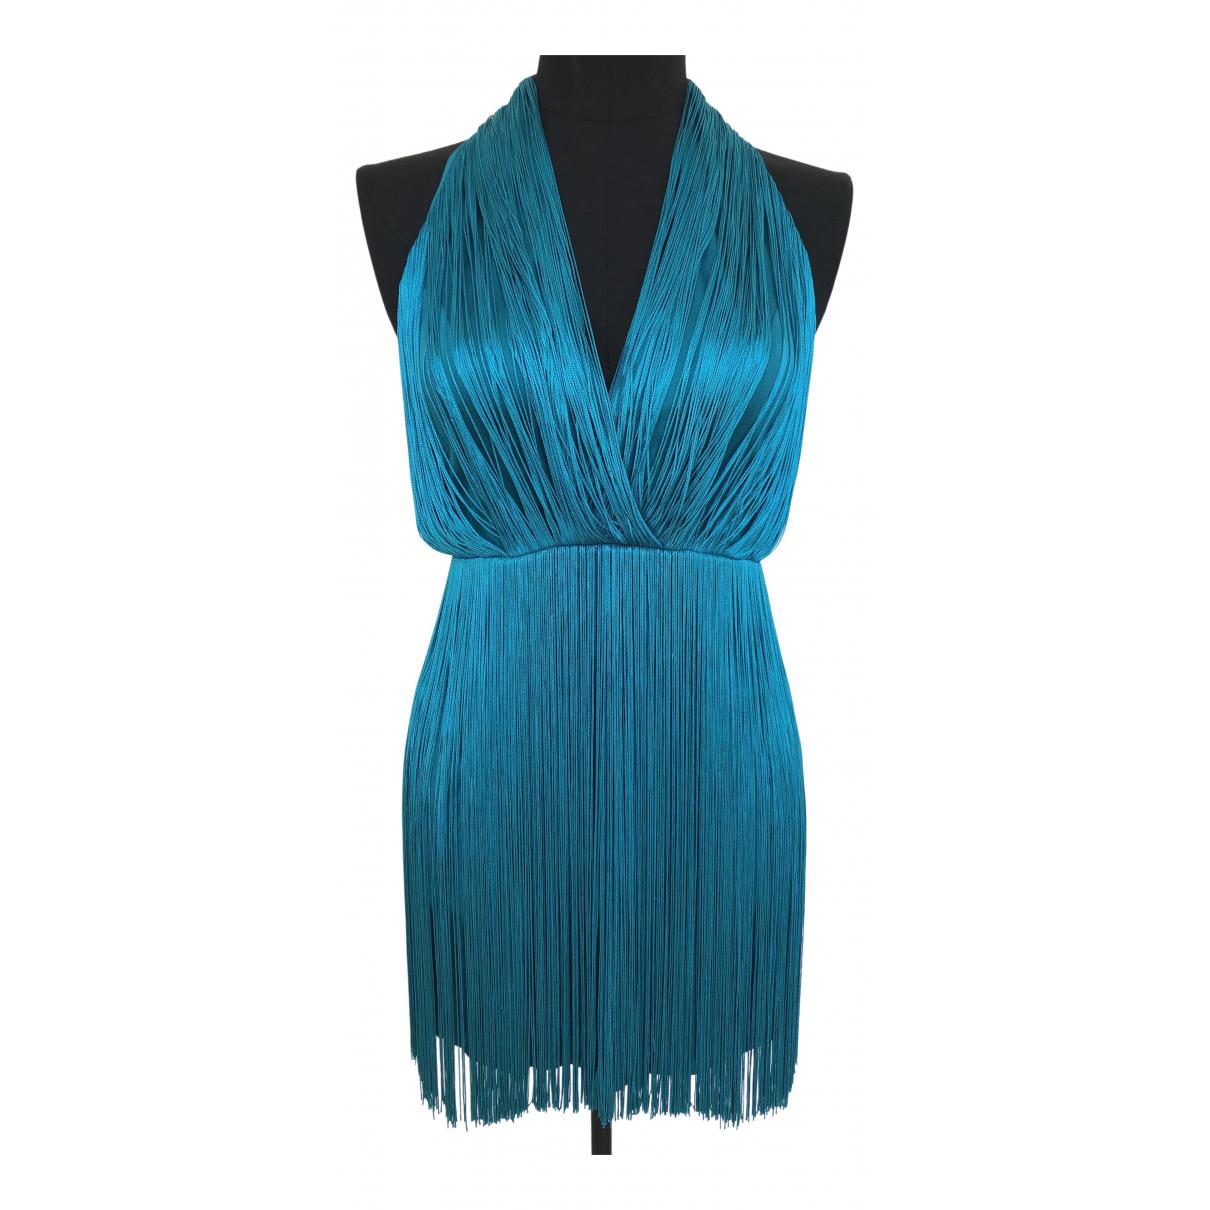 Tamara Mellon \N Kleid in  Blau Viskose